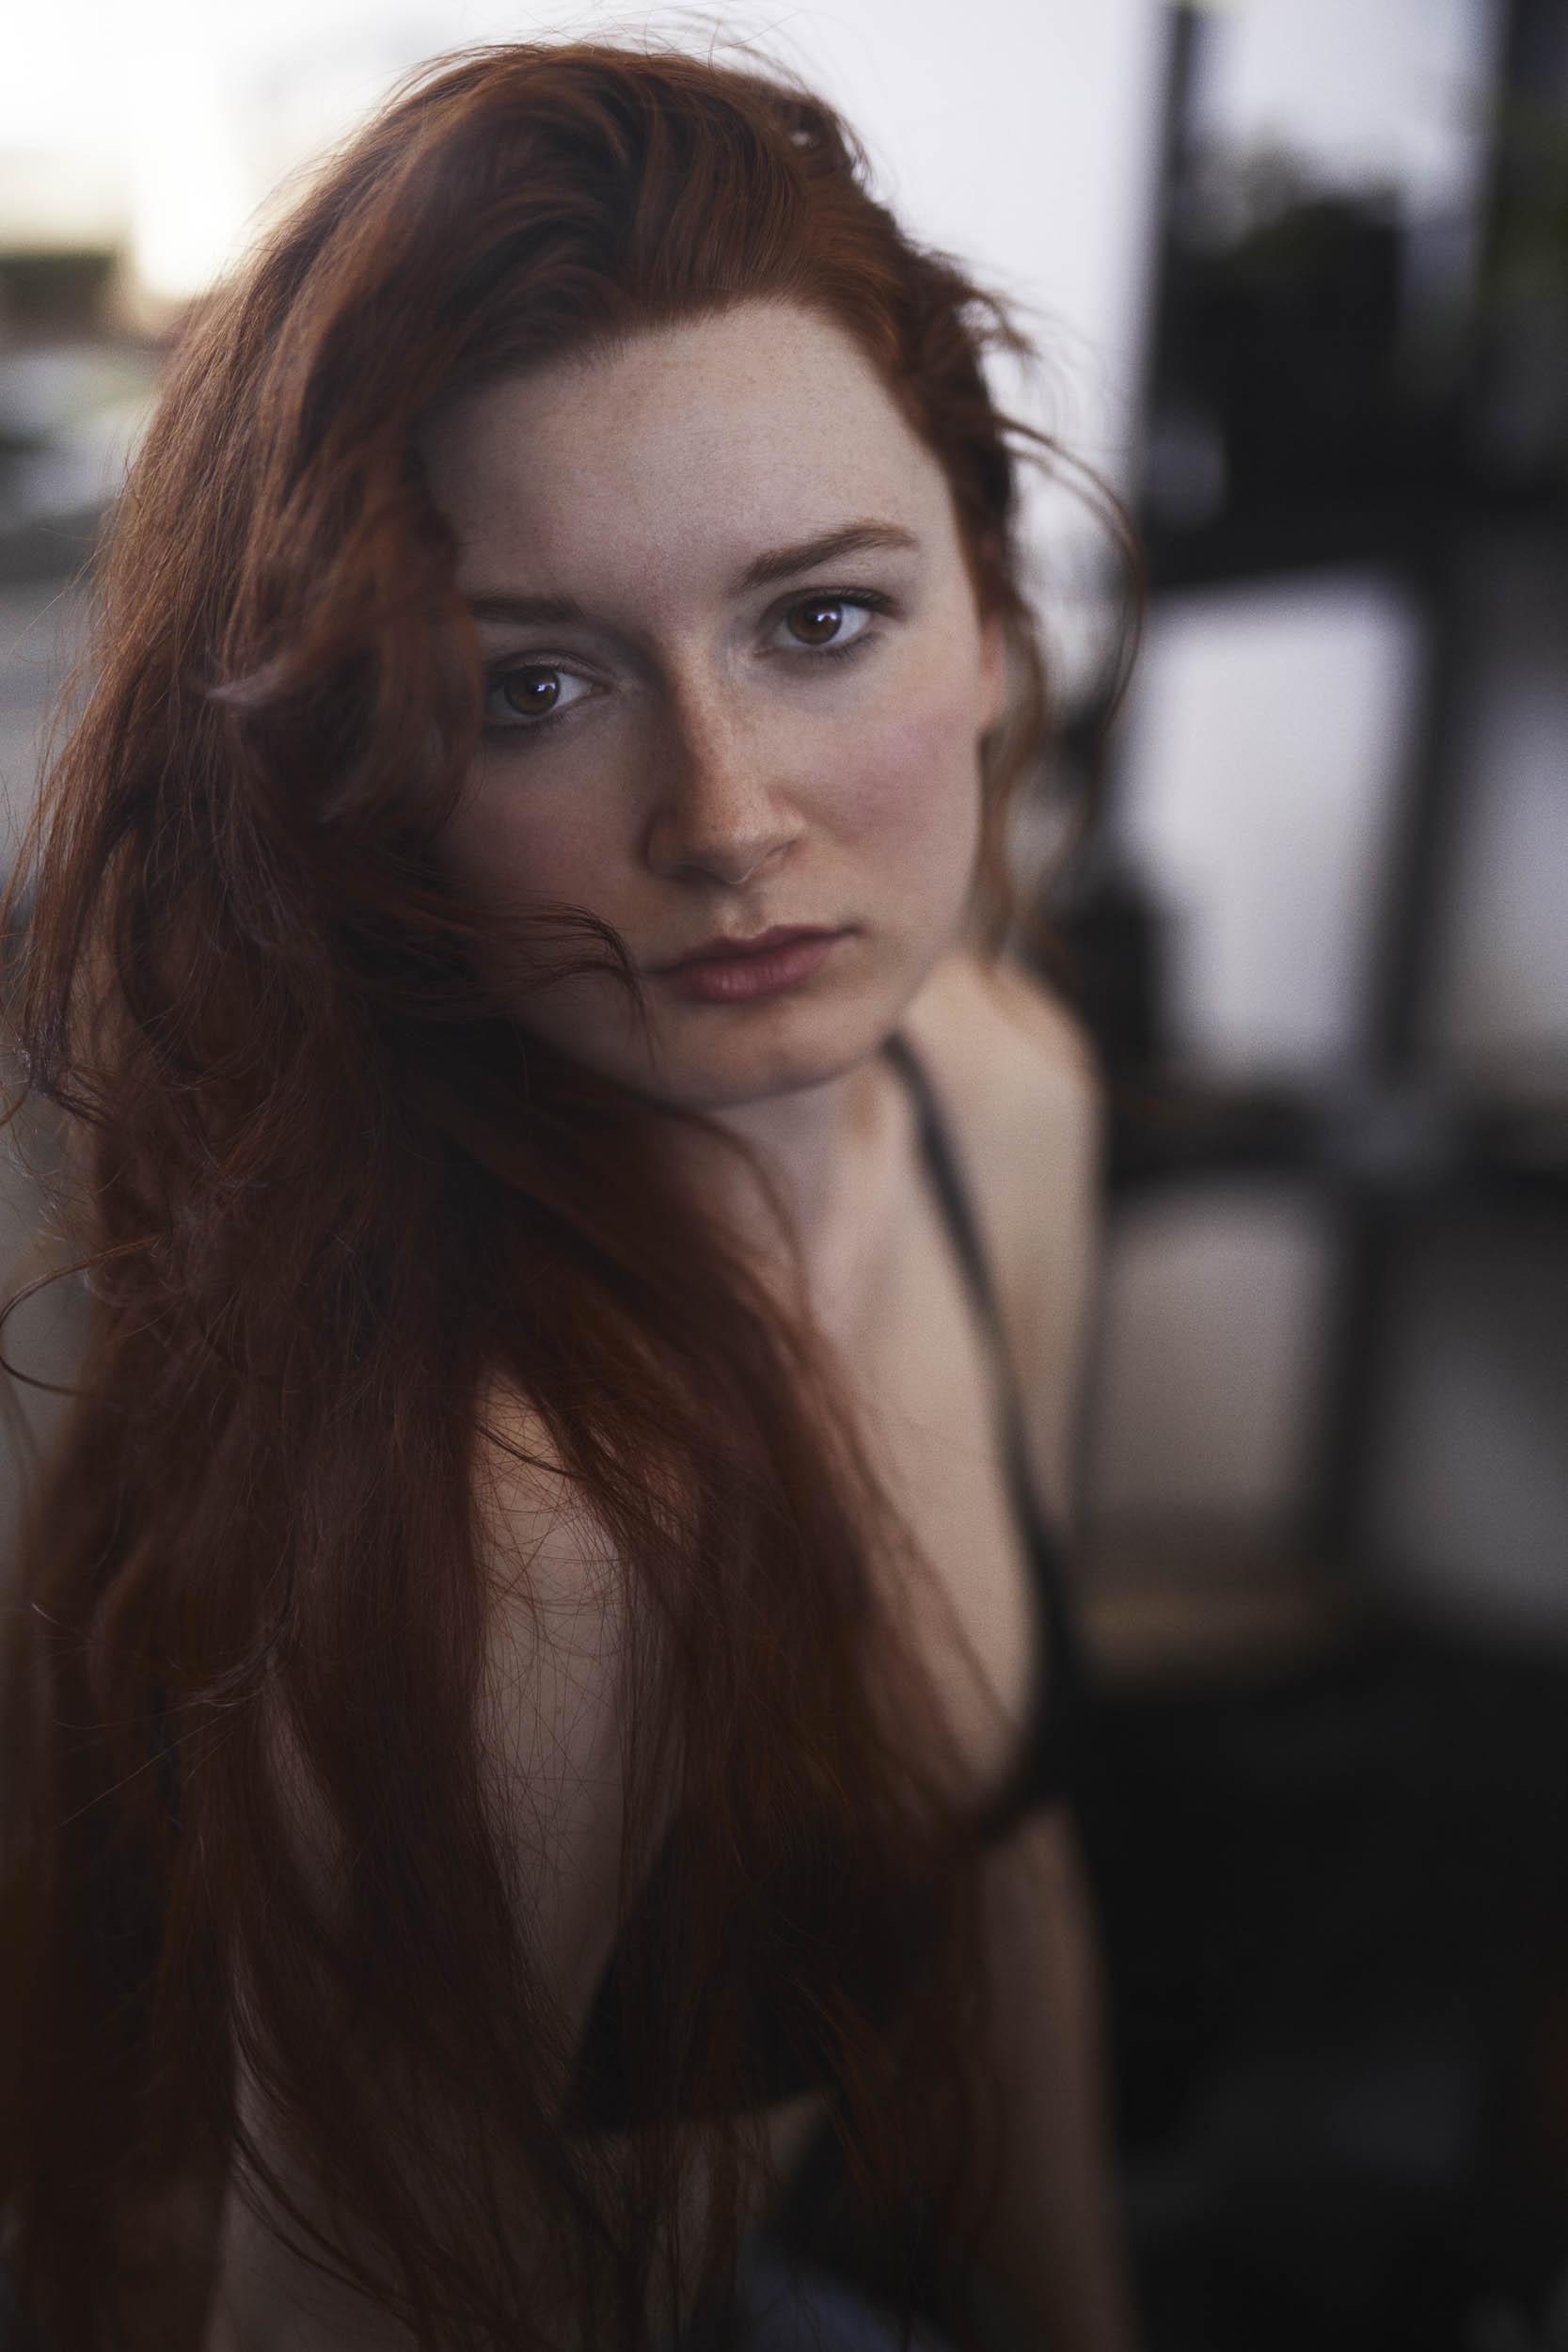 Actress Miranda Turbitt photographed by Nick Walters4.jpg